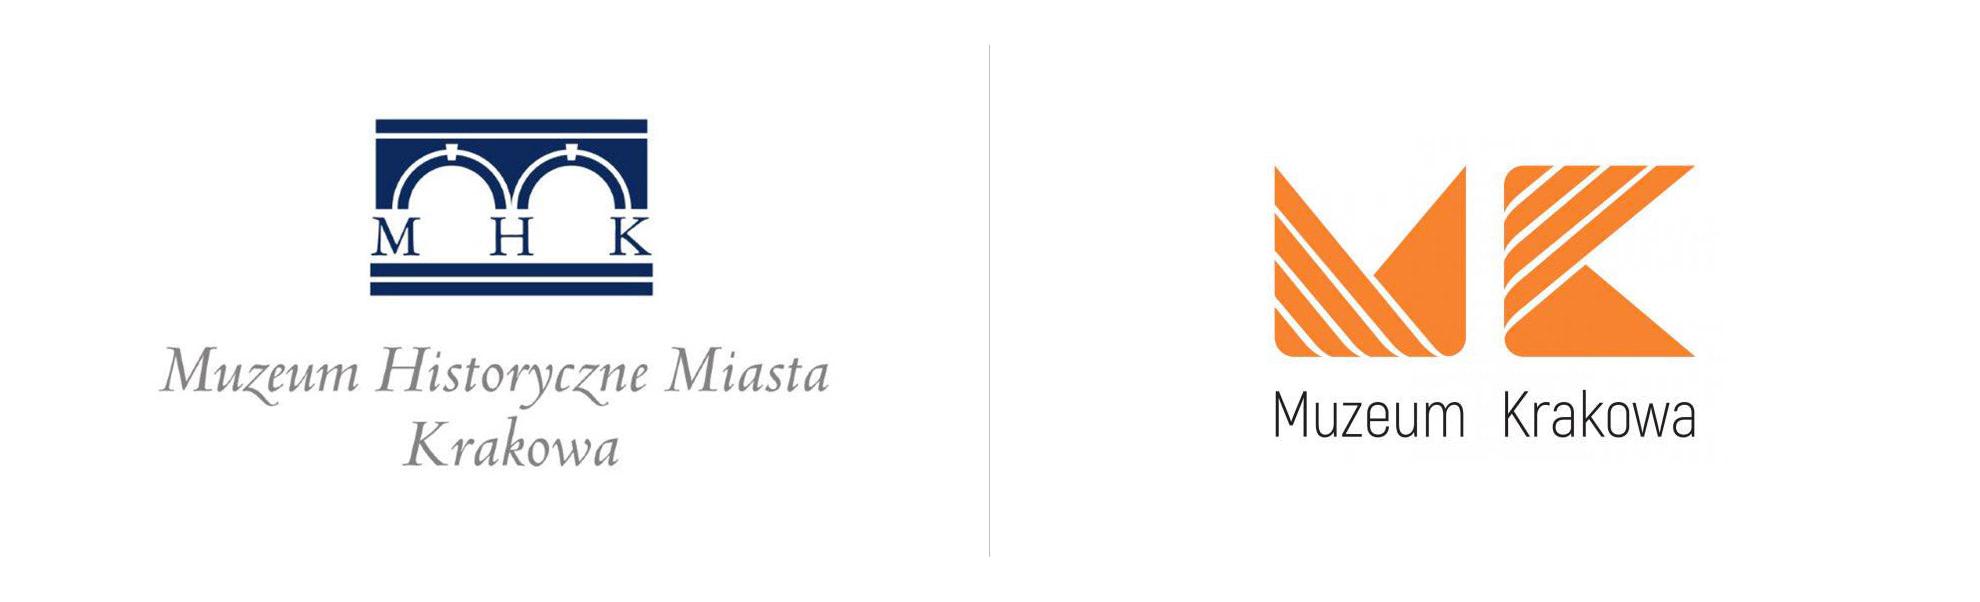 nowe istare logo muzeum krakowa